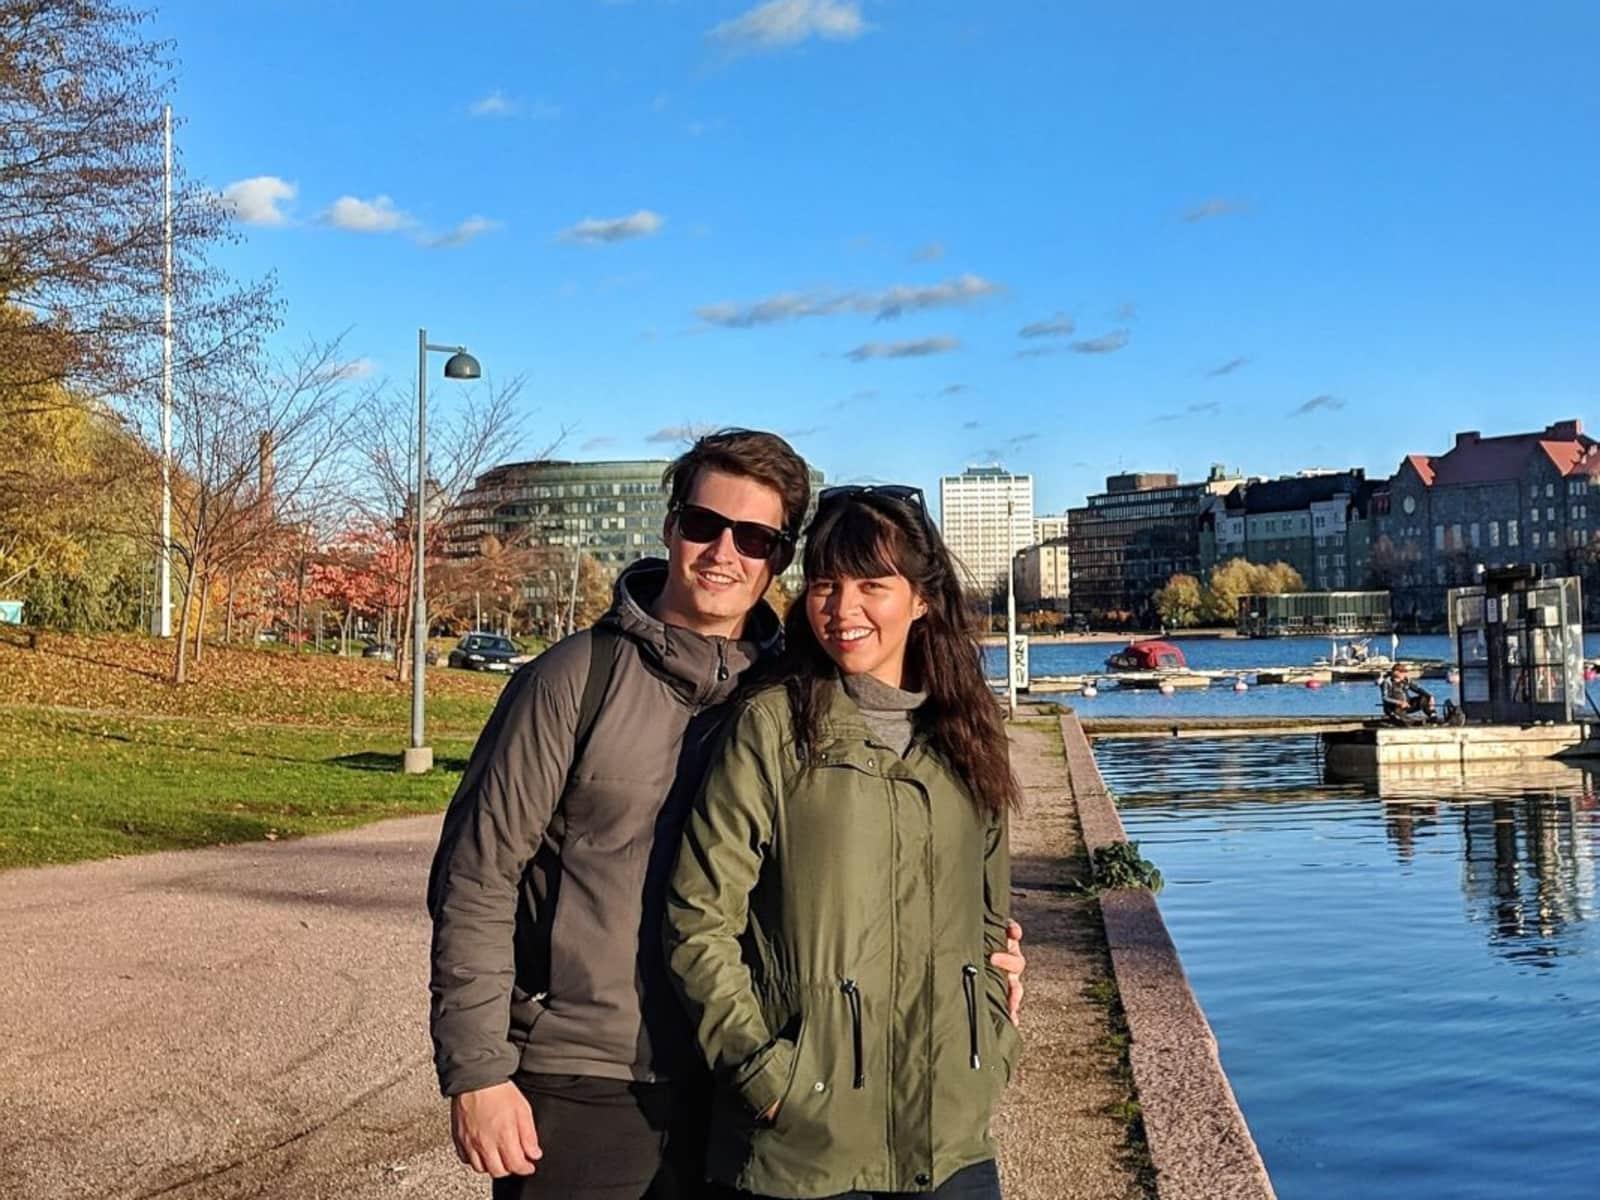 Melanie & Benjamin from Melbourne, Victoria, Australia